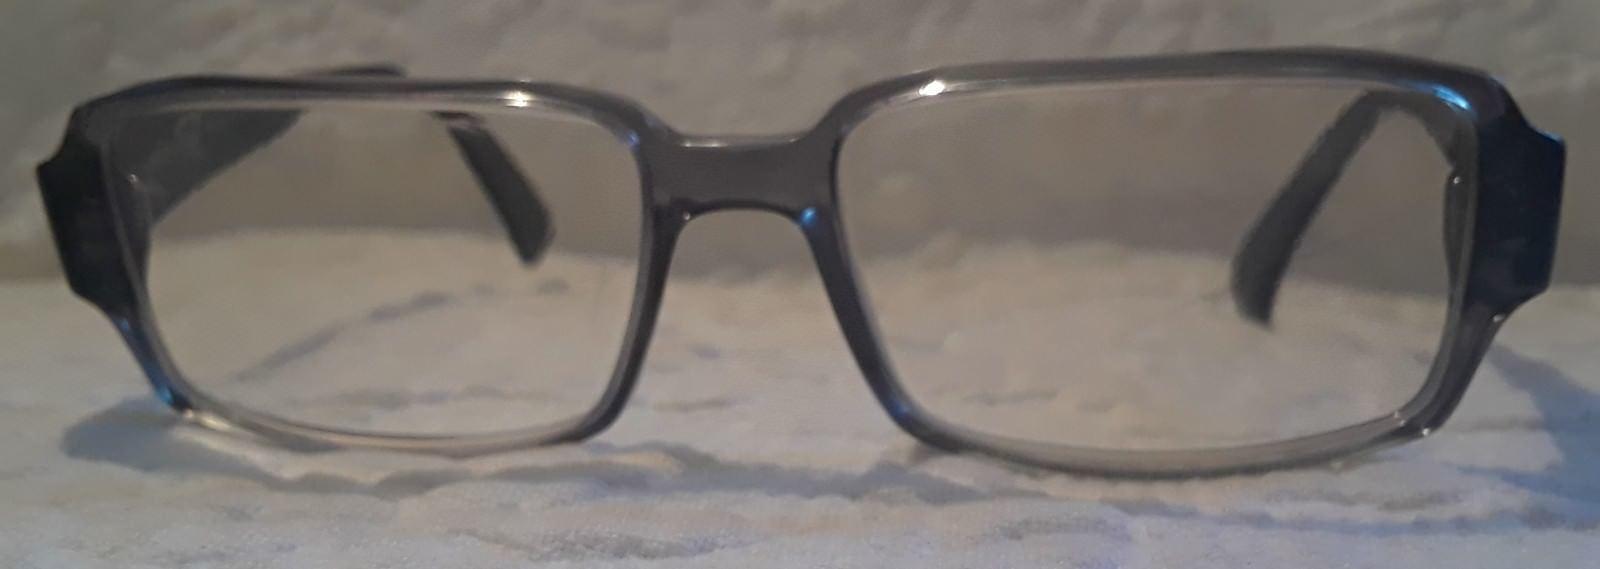 Calvin Klein CK844 Unisex Prescription Eyeglasses Frames Gray #091 Italy